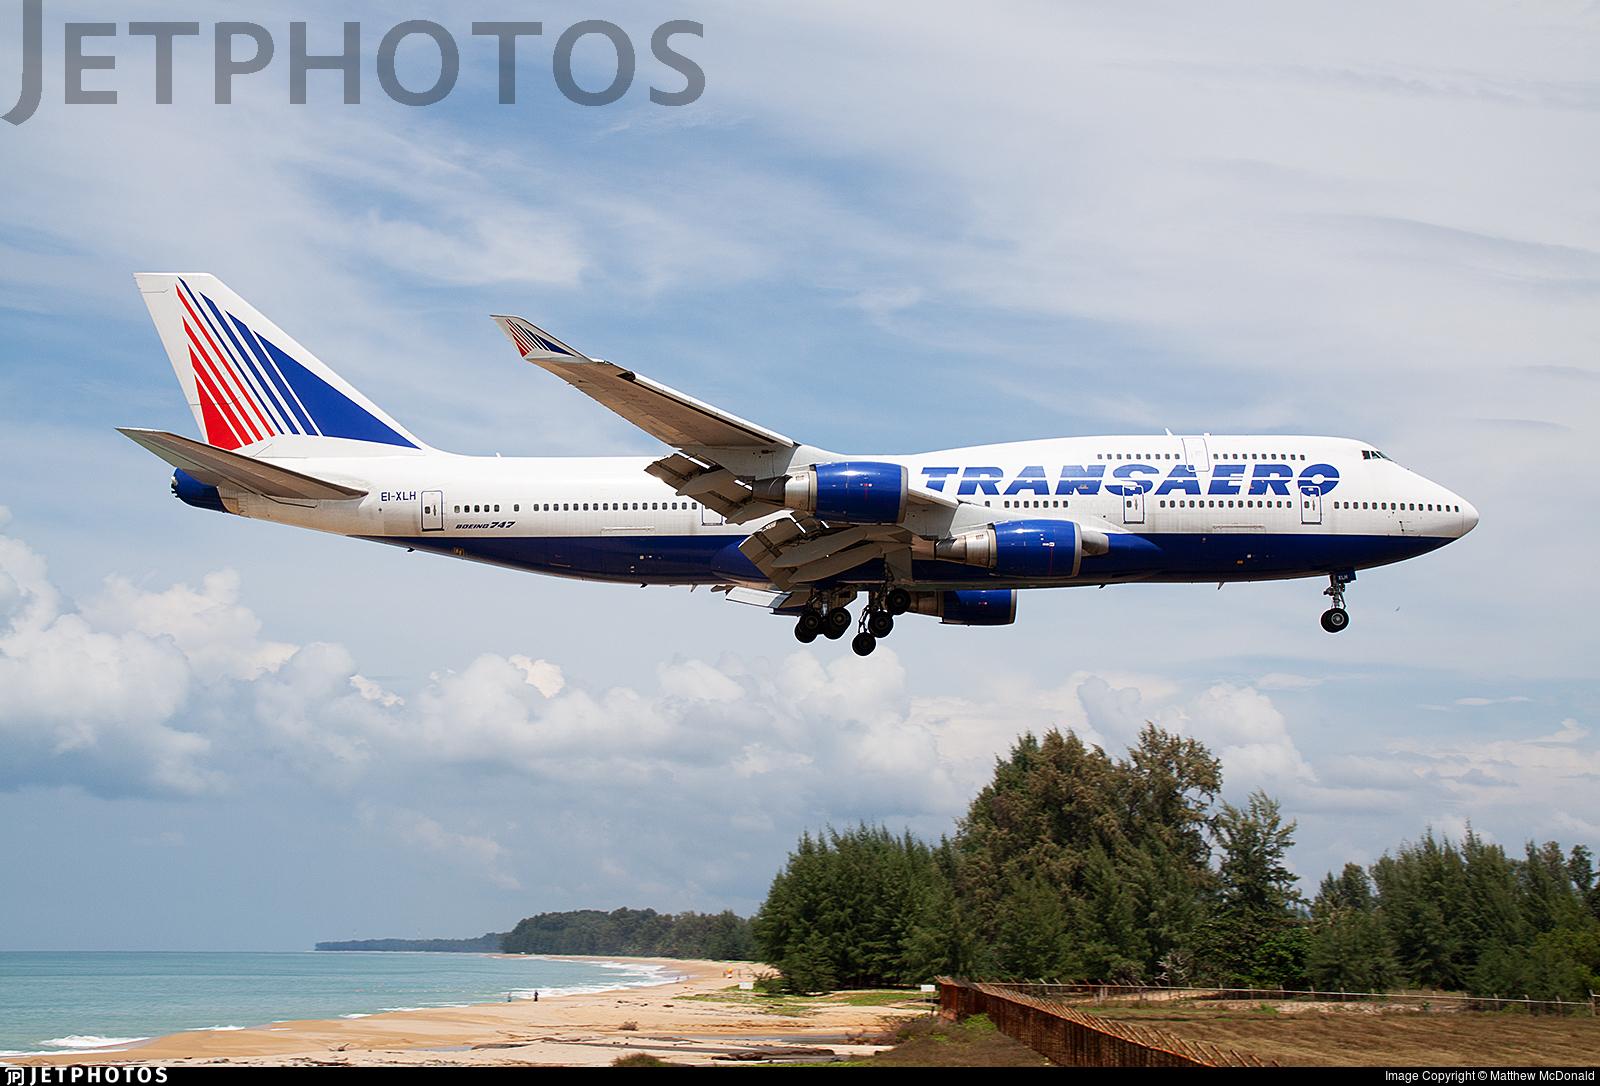 EI-XLH - Boeing 747-446 - Transaero Airlines